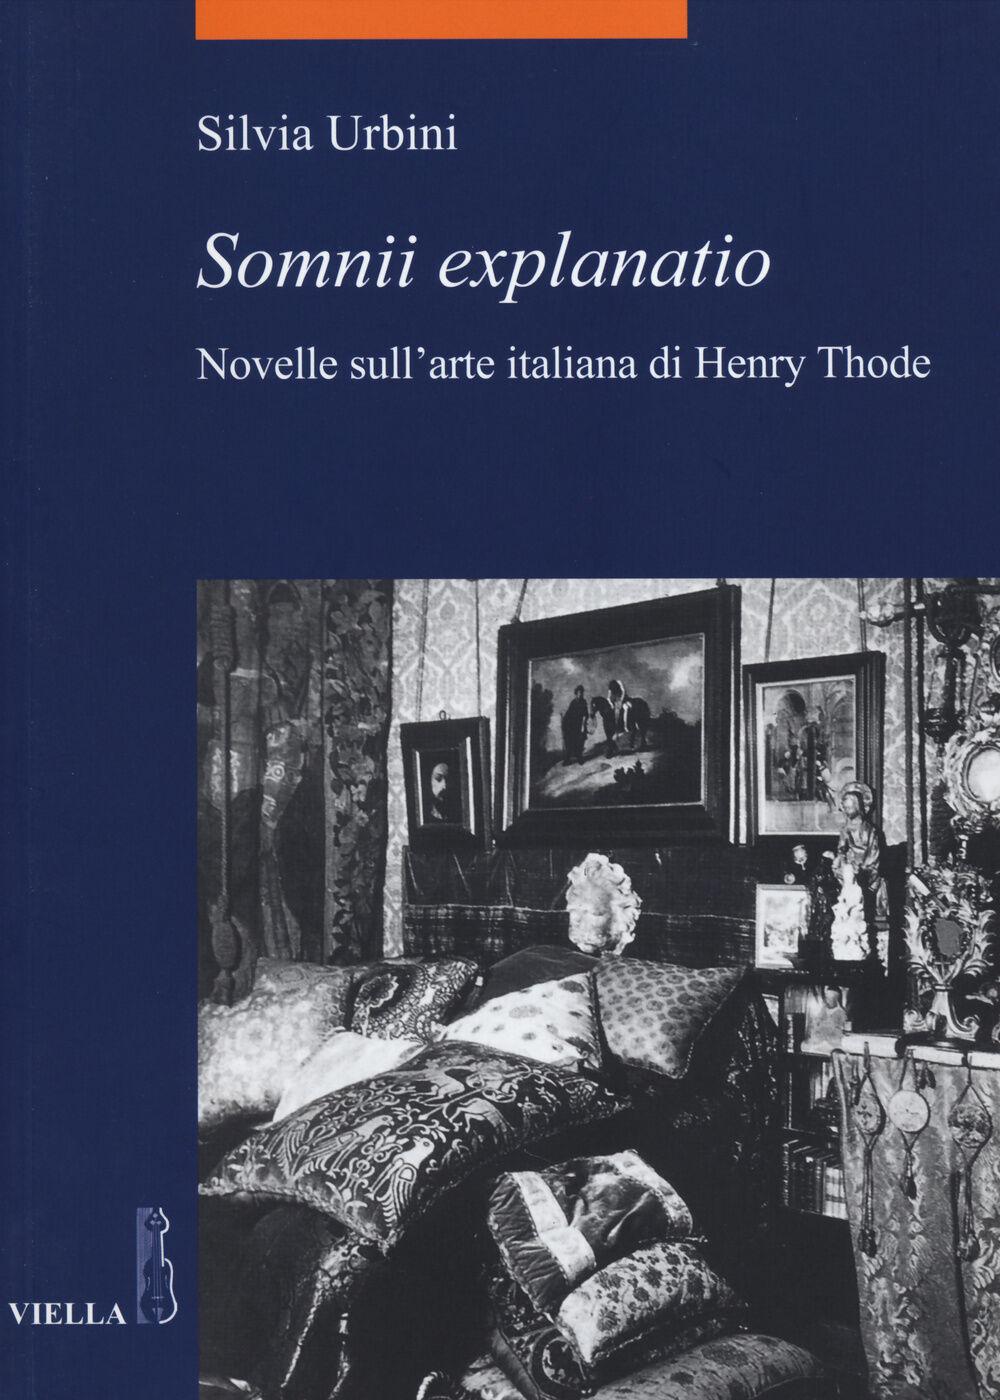 «Somnii explanatio». Novelle sull'arte italiana di Henry Thode